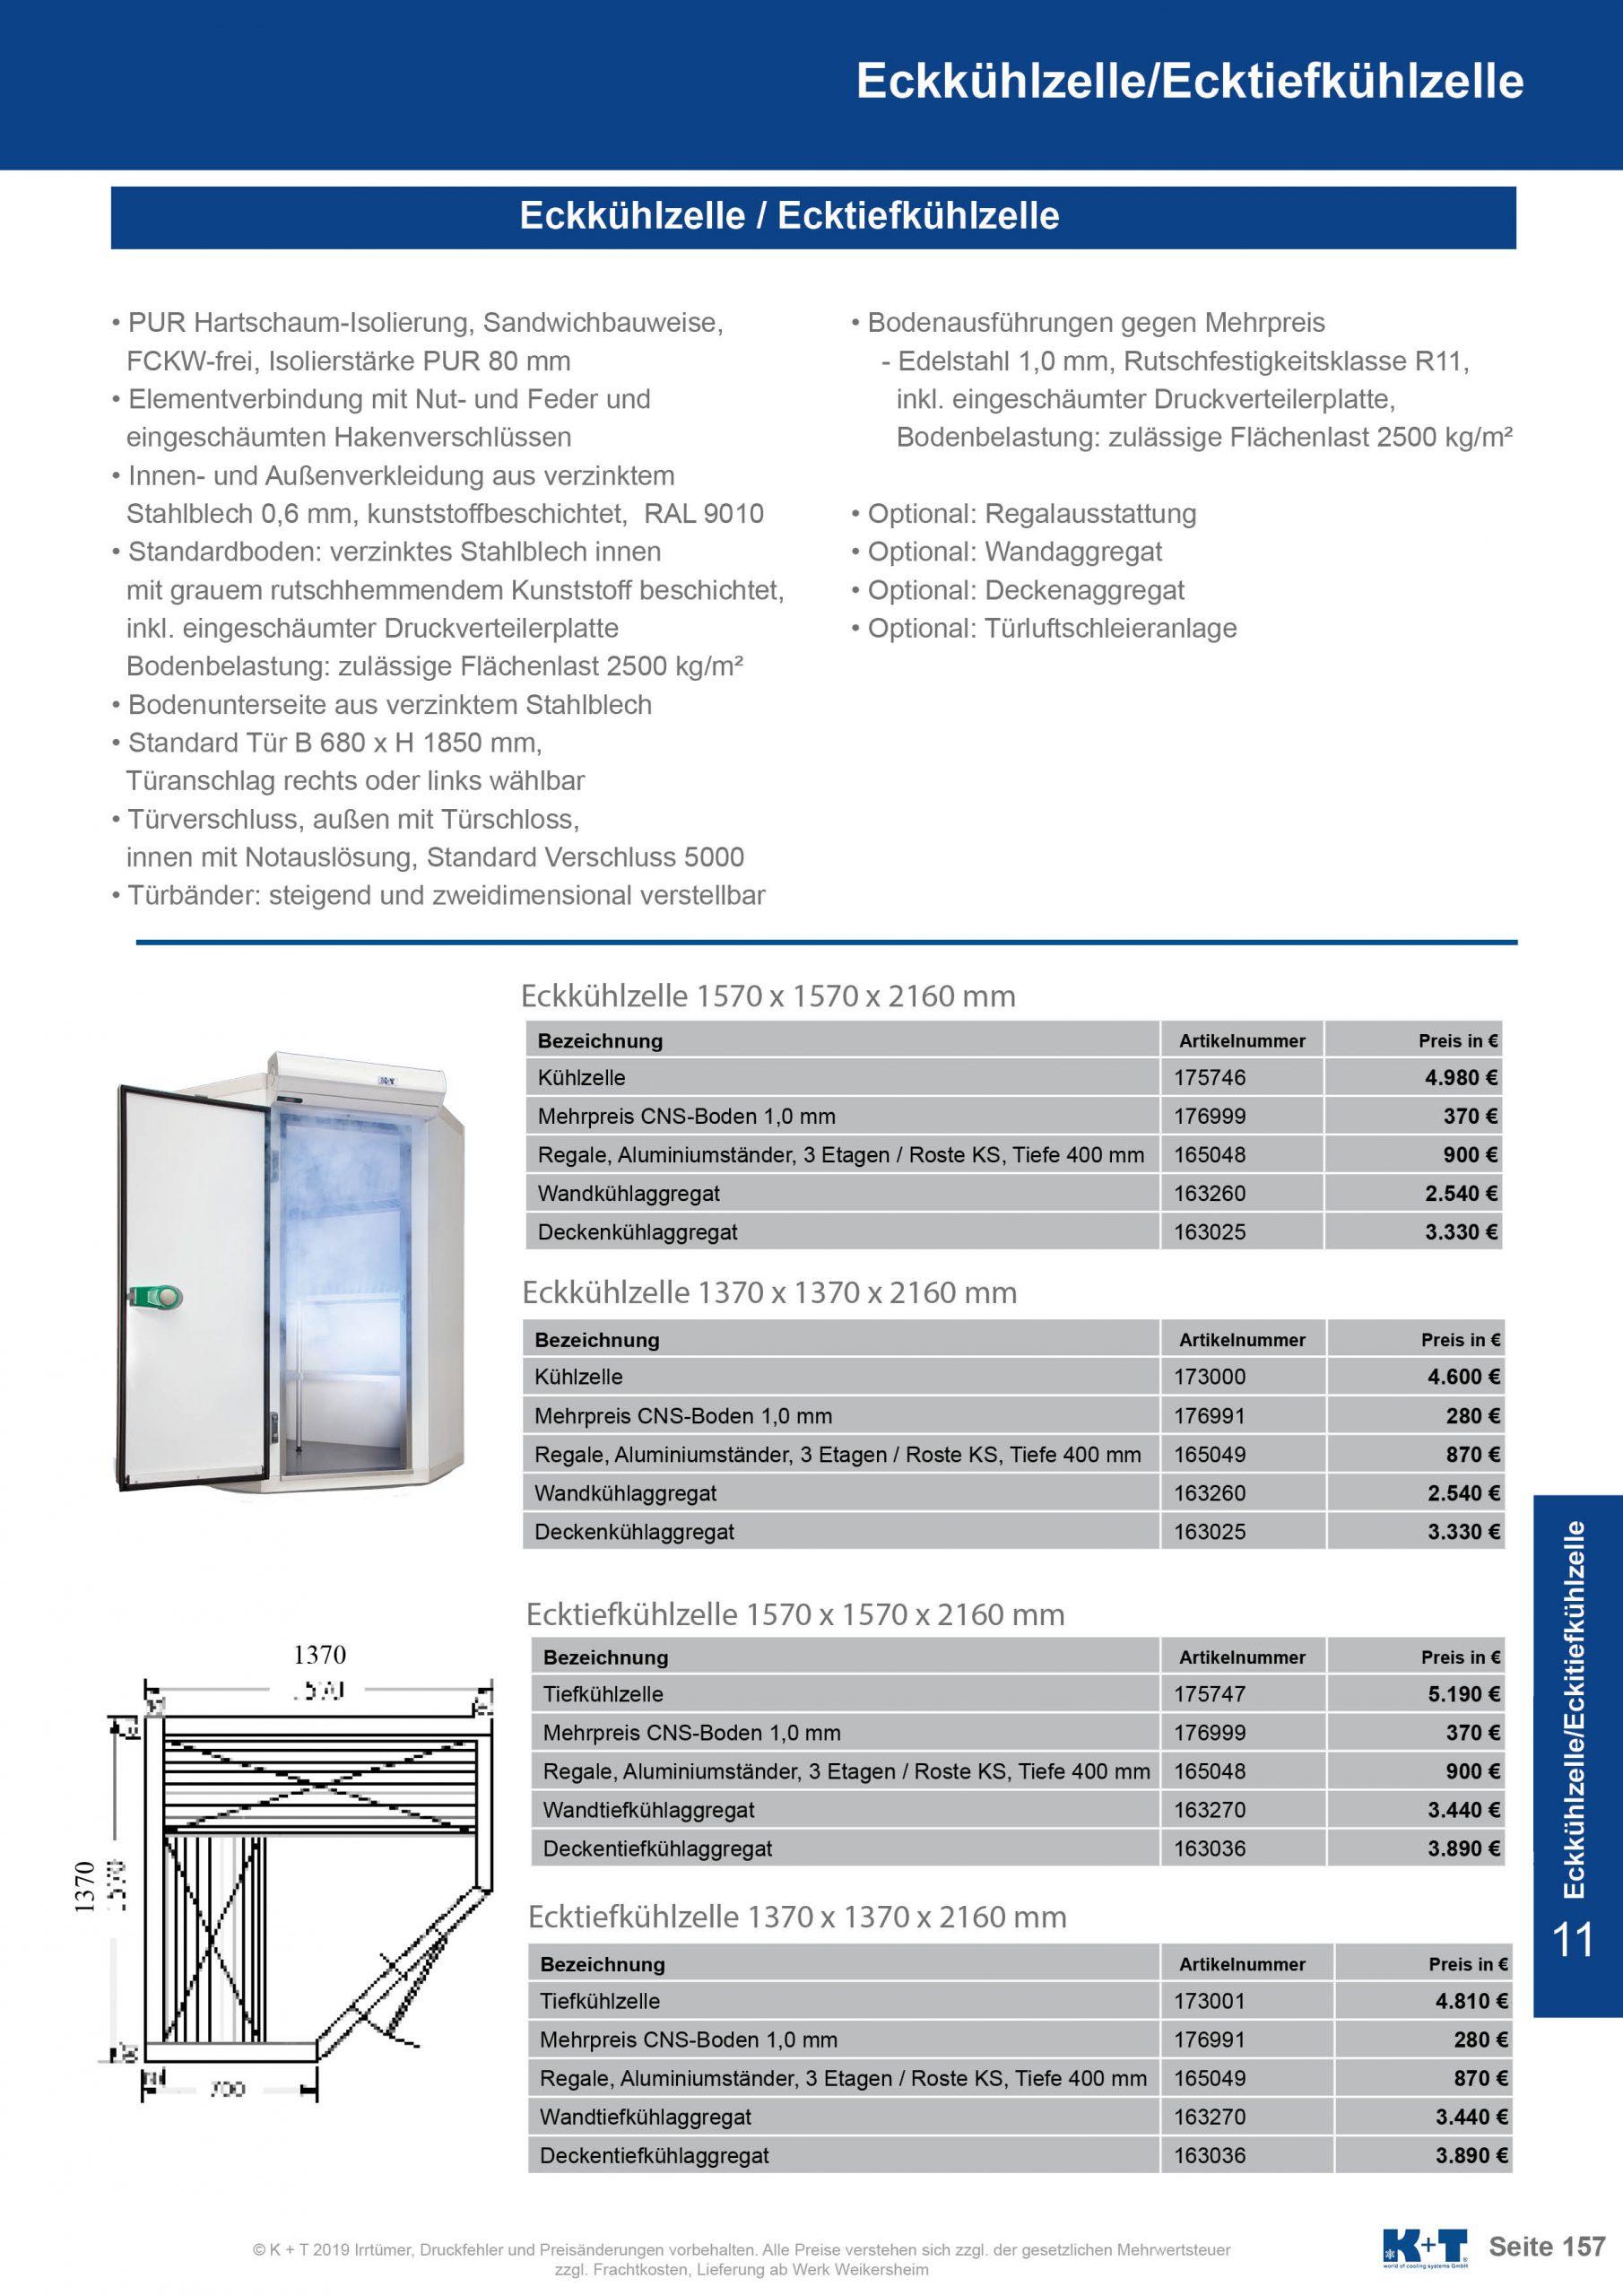 Eckkühl- Tiefkühlzelle